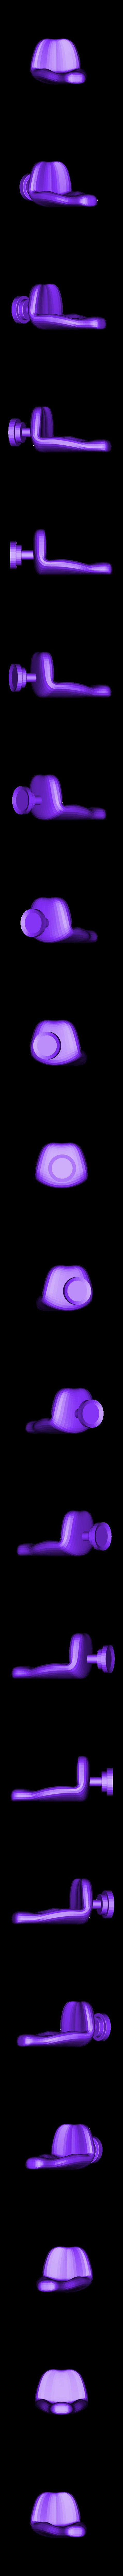 CP_02 (rep).stl Download free STL file Millenium Falcon, Cockpit.  • 3D printable object, Alex_x_x_x